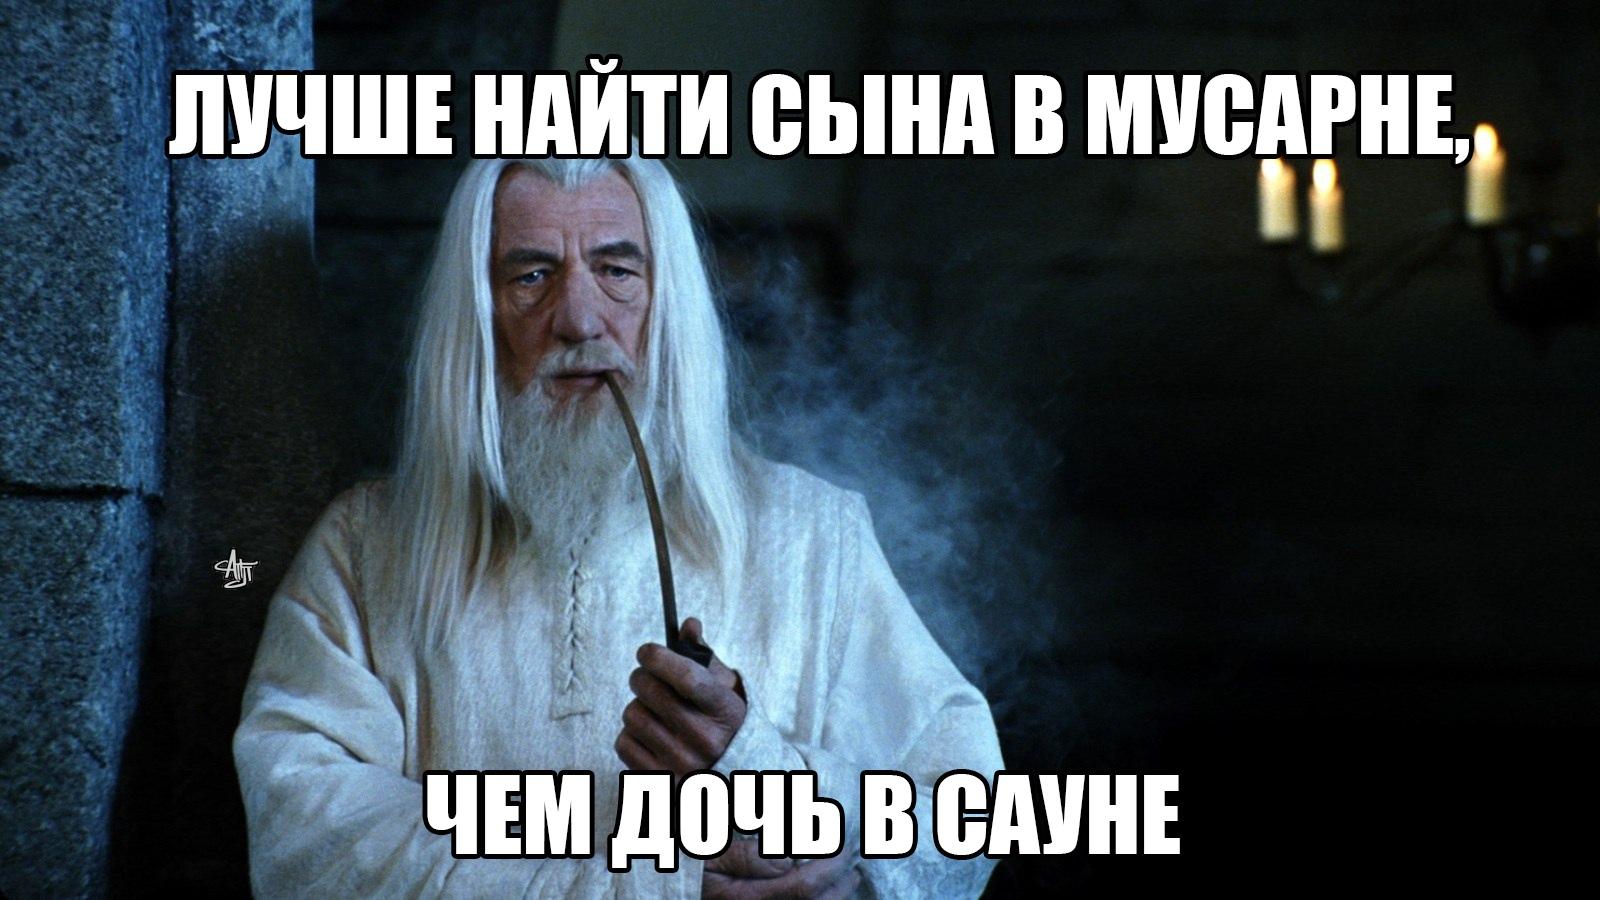 https://pp.userapi.com/c849220/v849220813/23e97/LyfSuumplRo.jpg